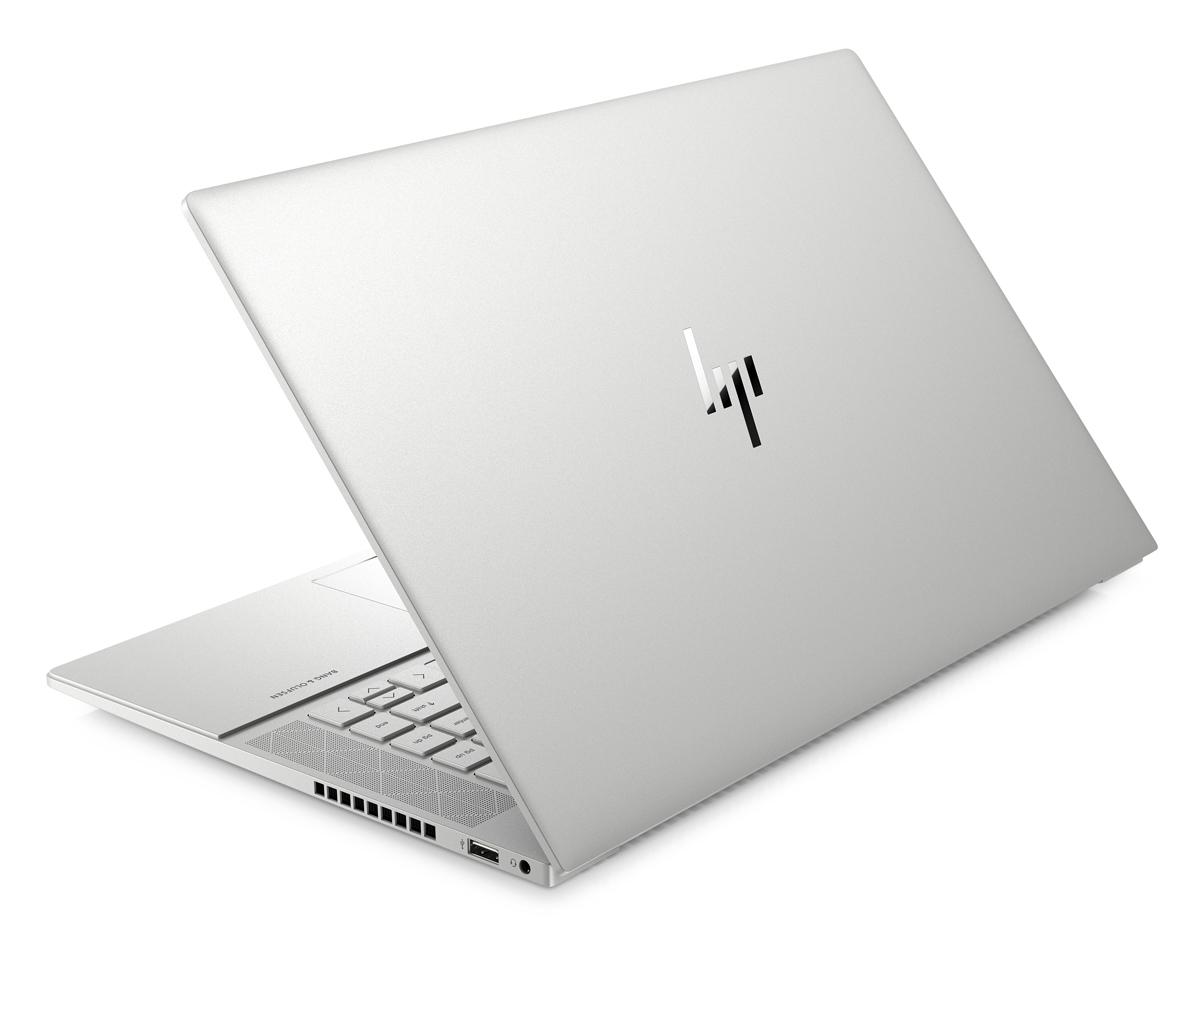 HP Envy 15 Laptop Creative Price Malaysia